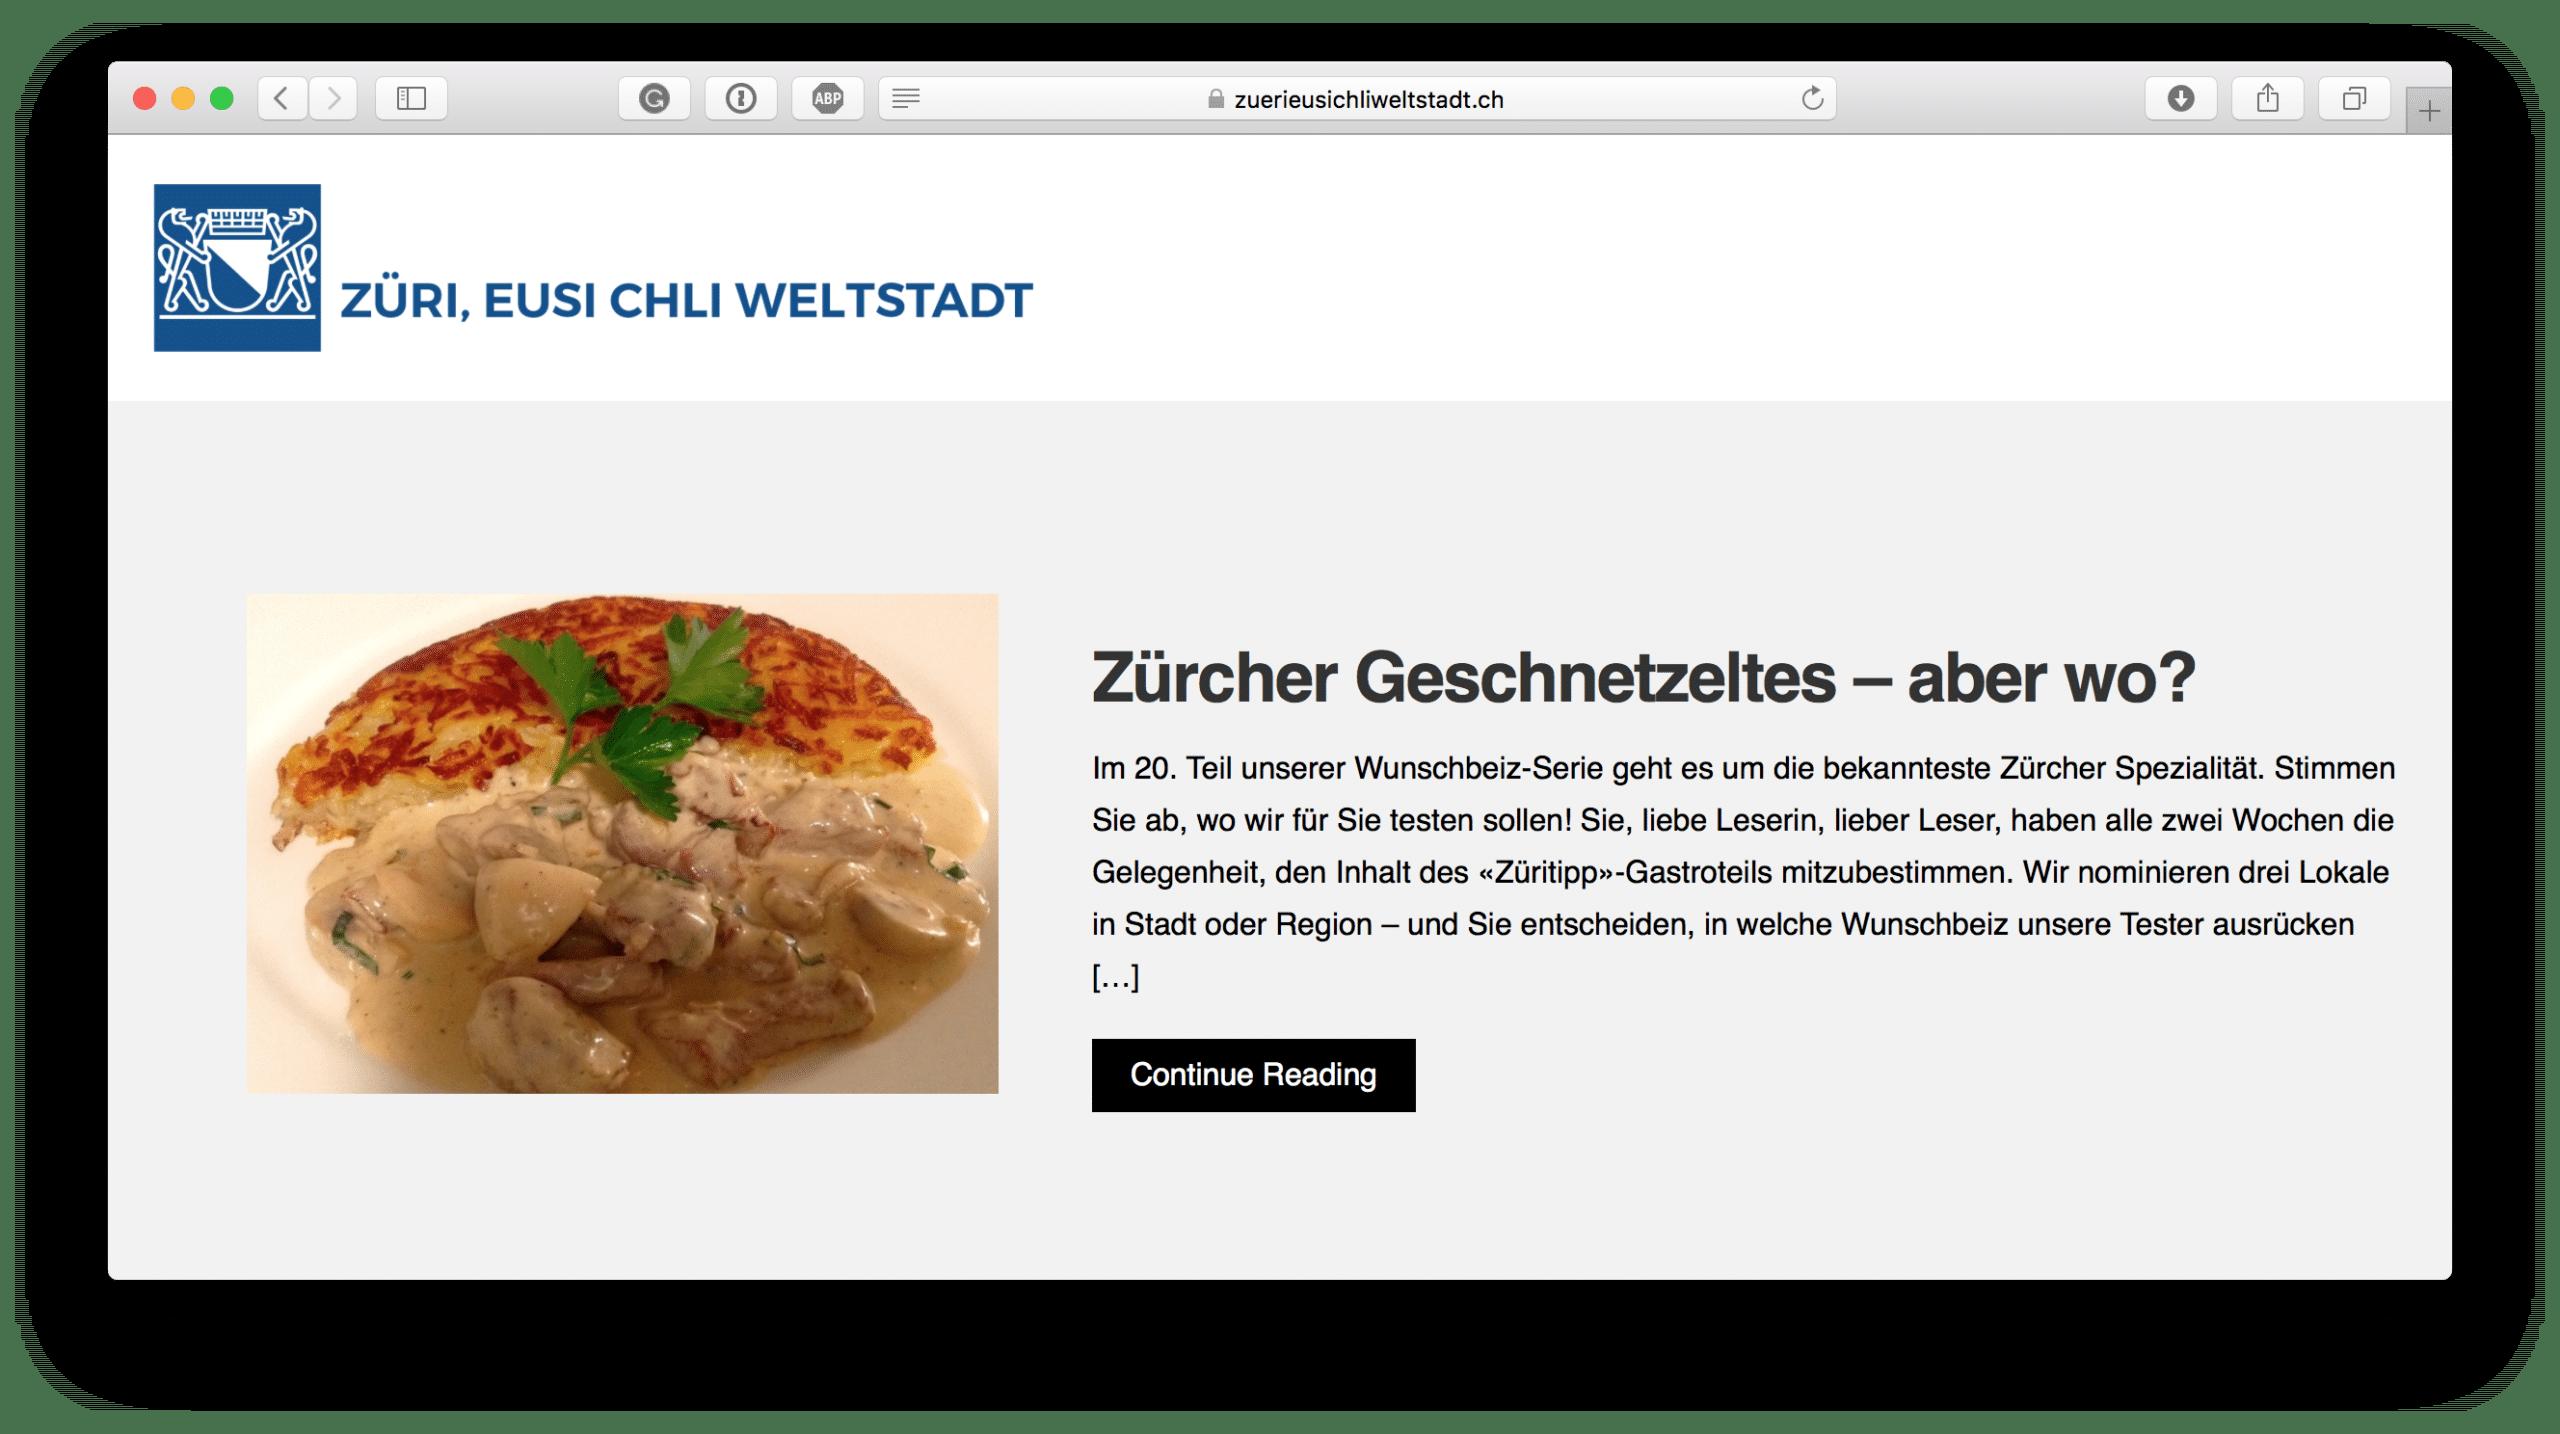 Züri, eusi chli Weltstadt